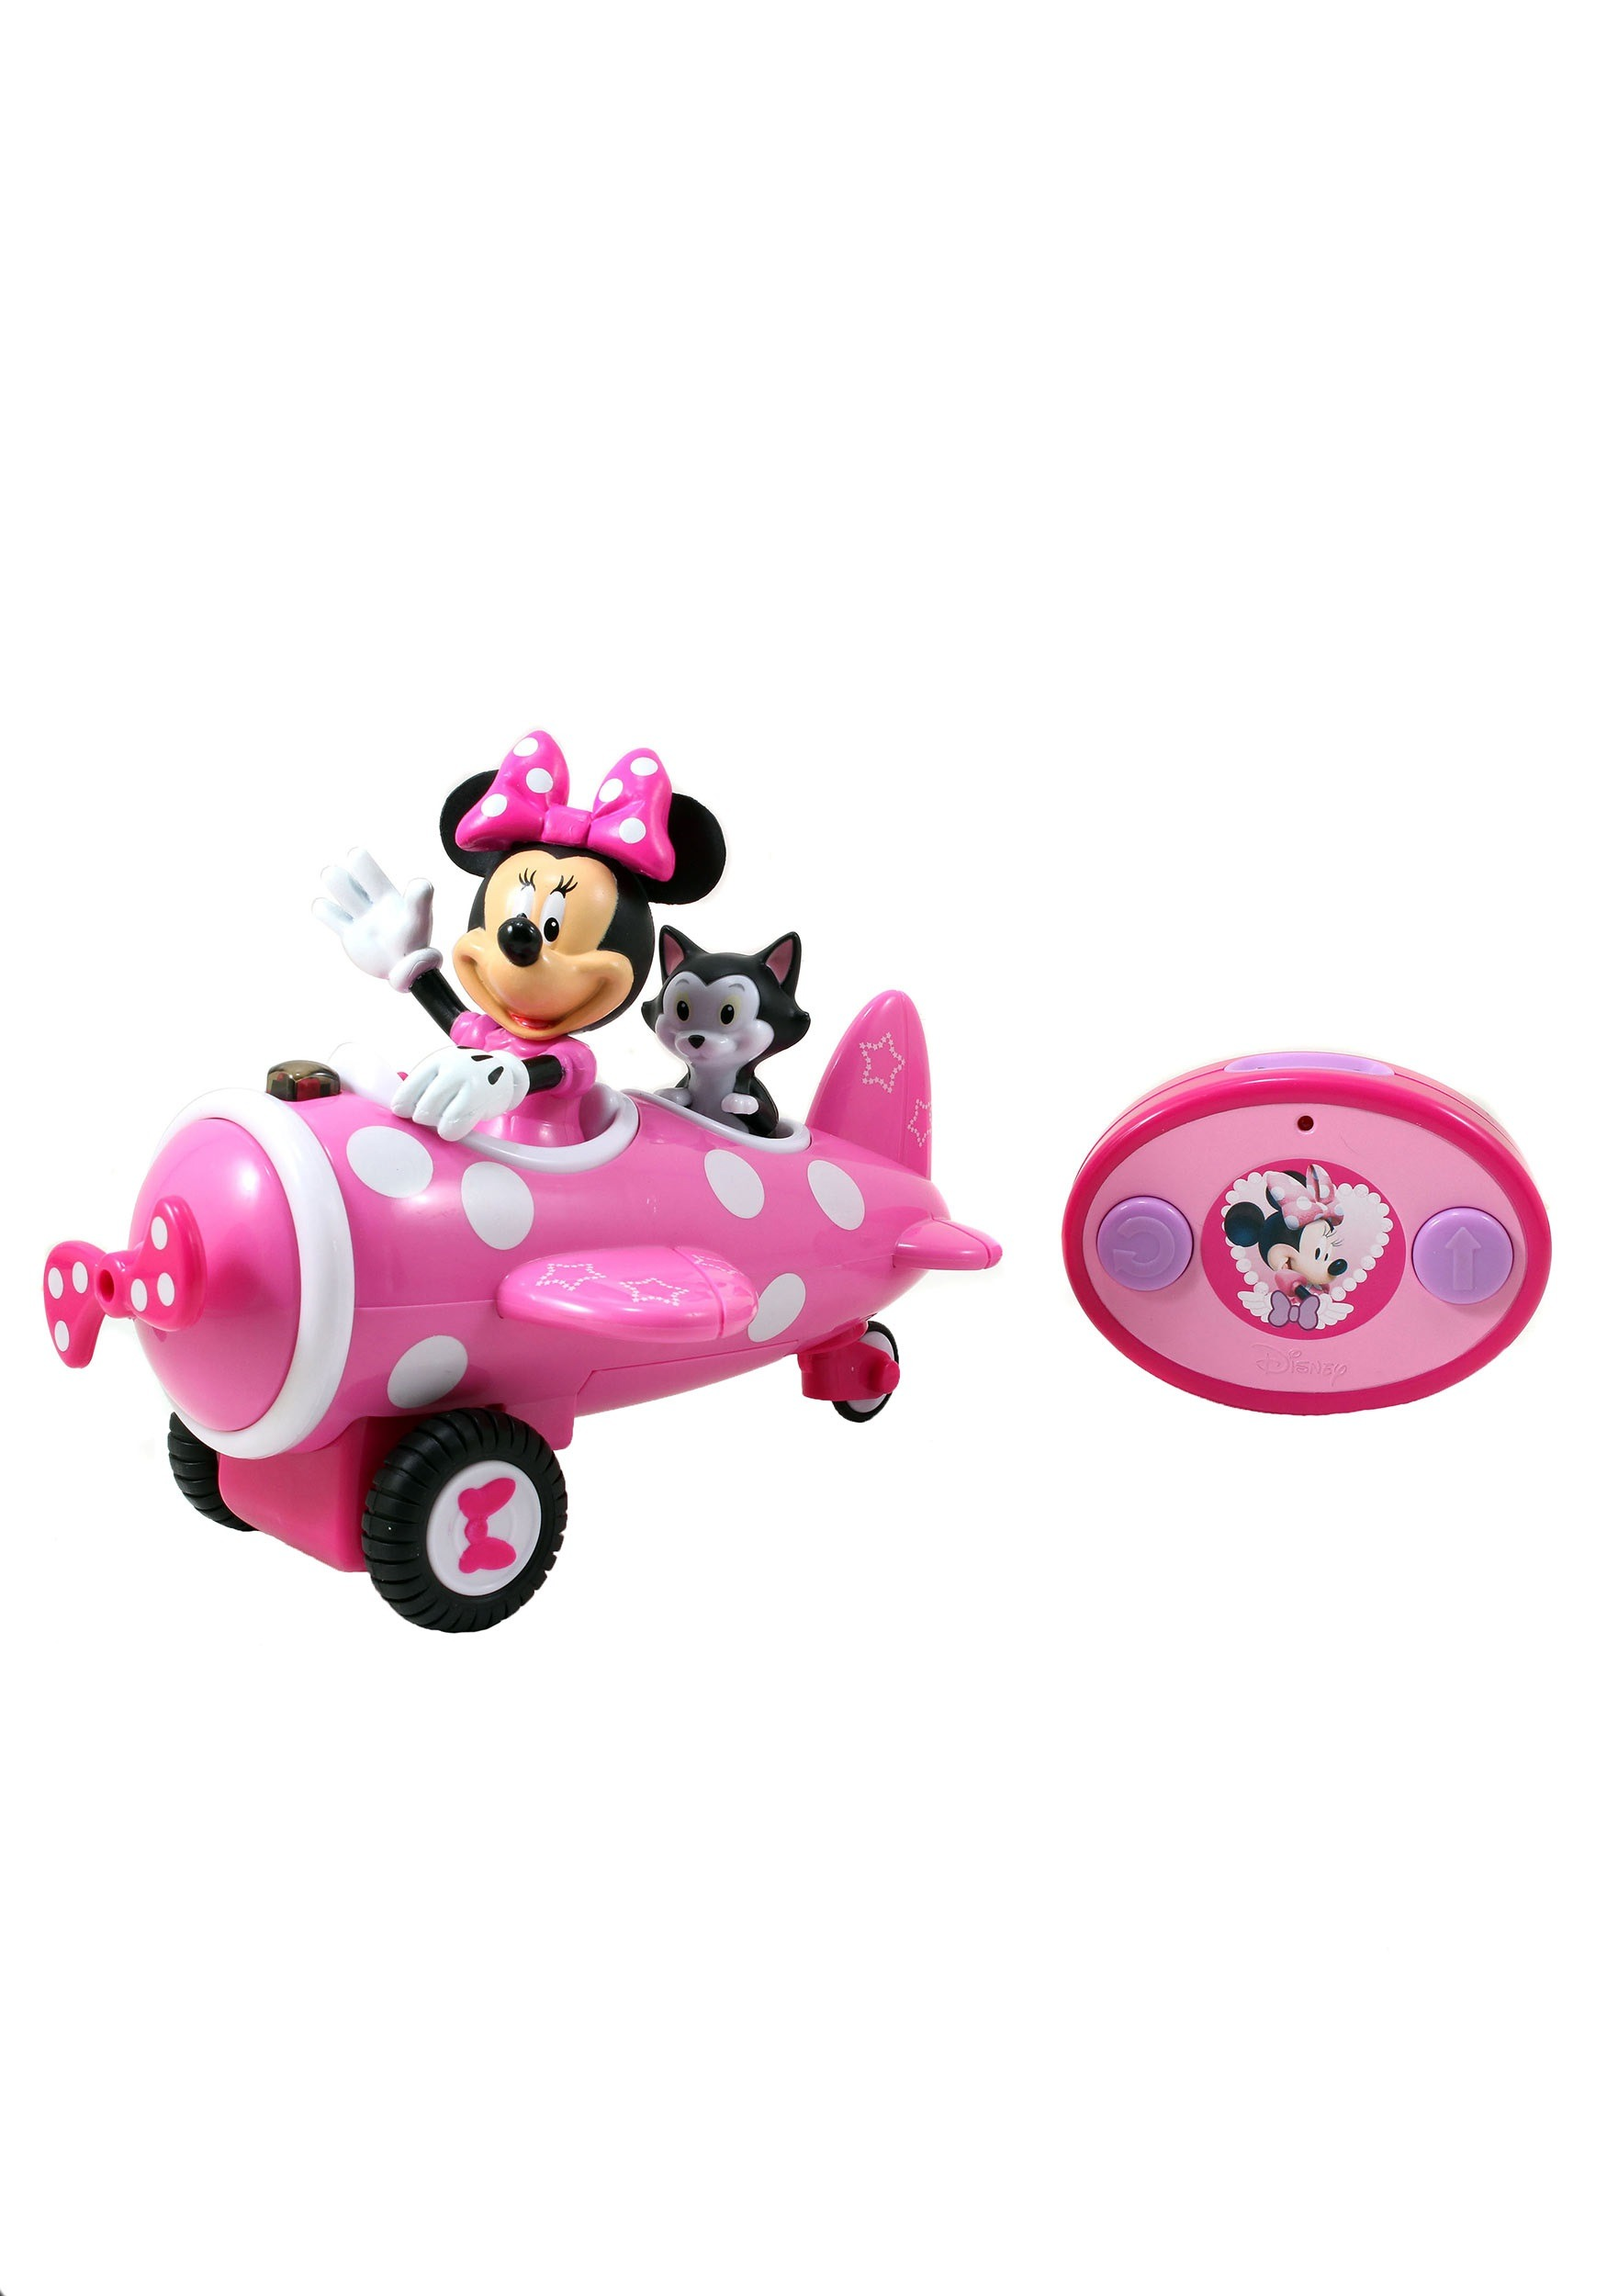 Disney Minnie Mouse R/C Airplane